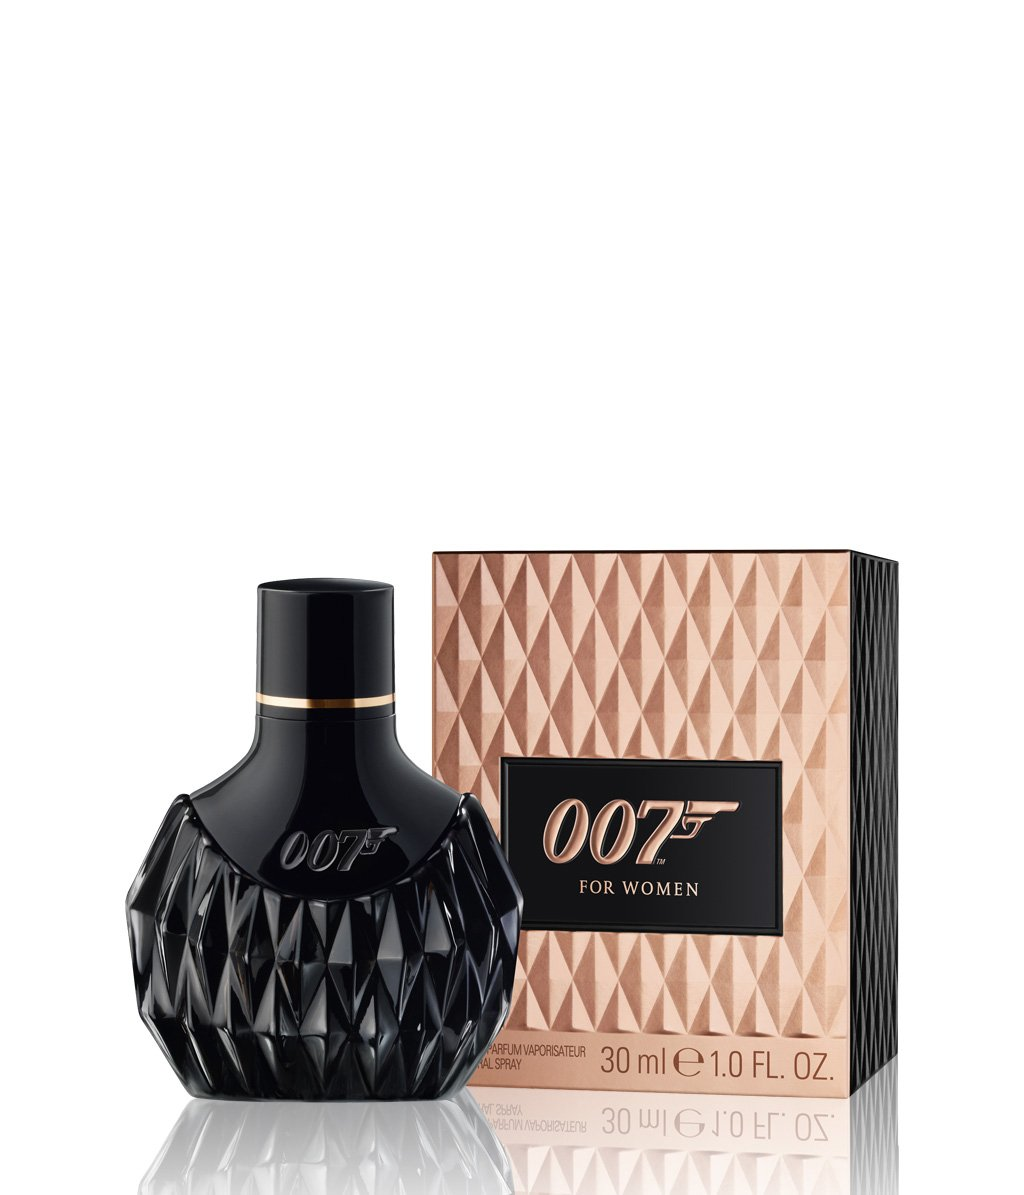 james bond 007 for women parfum bestellen gratisversand. Black Bedroom Furniture Sets. Home Design Ideas